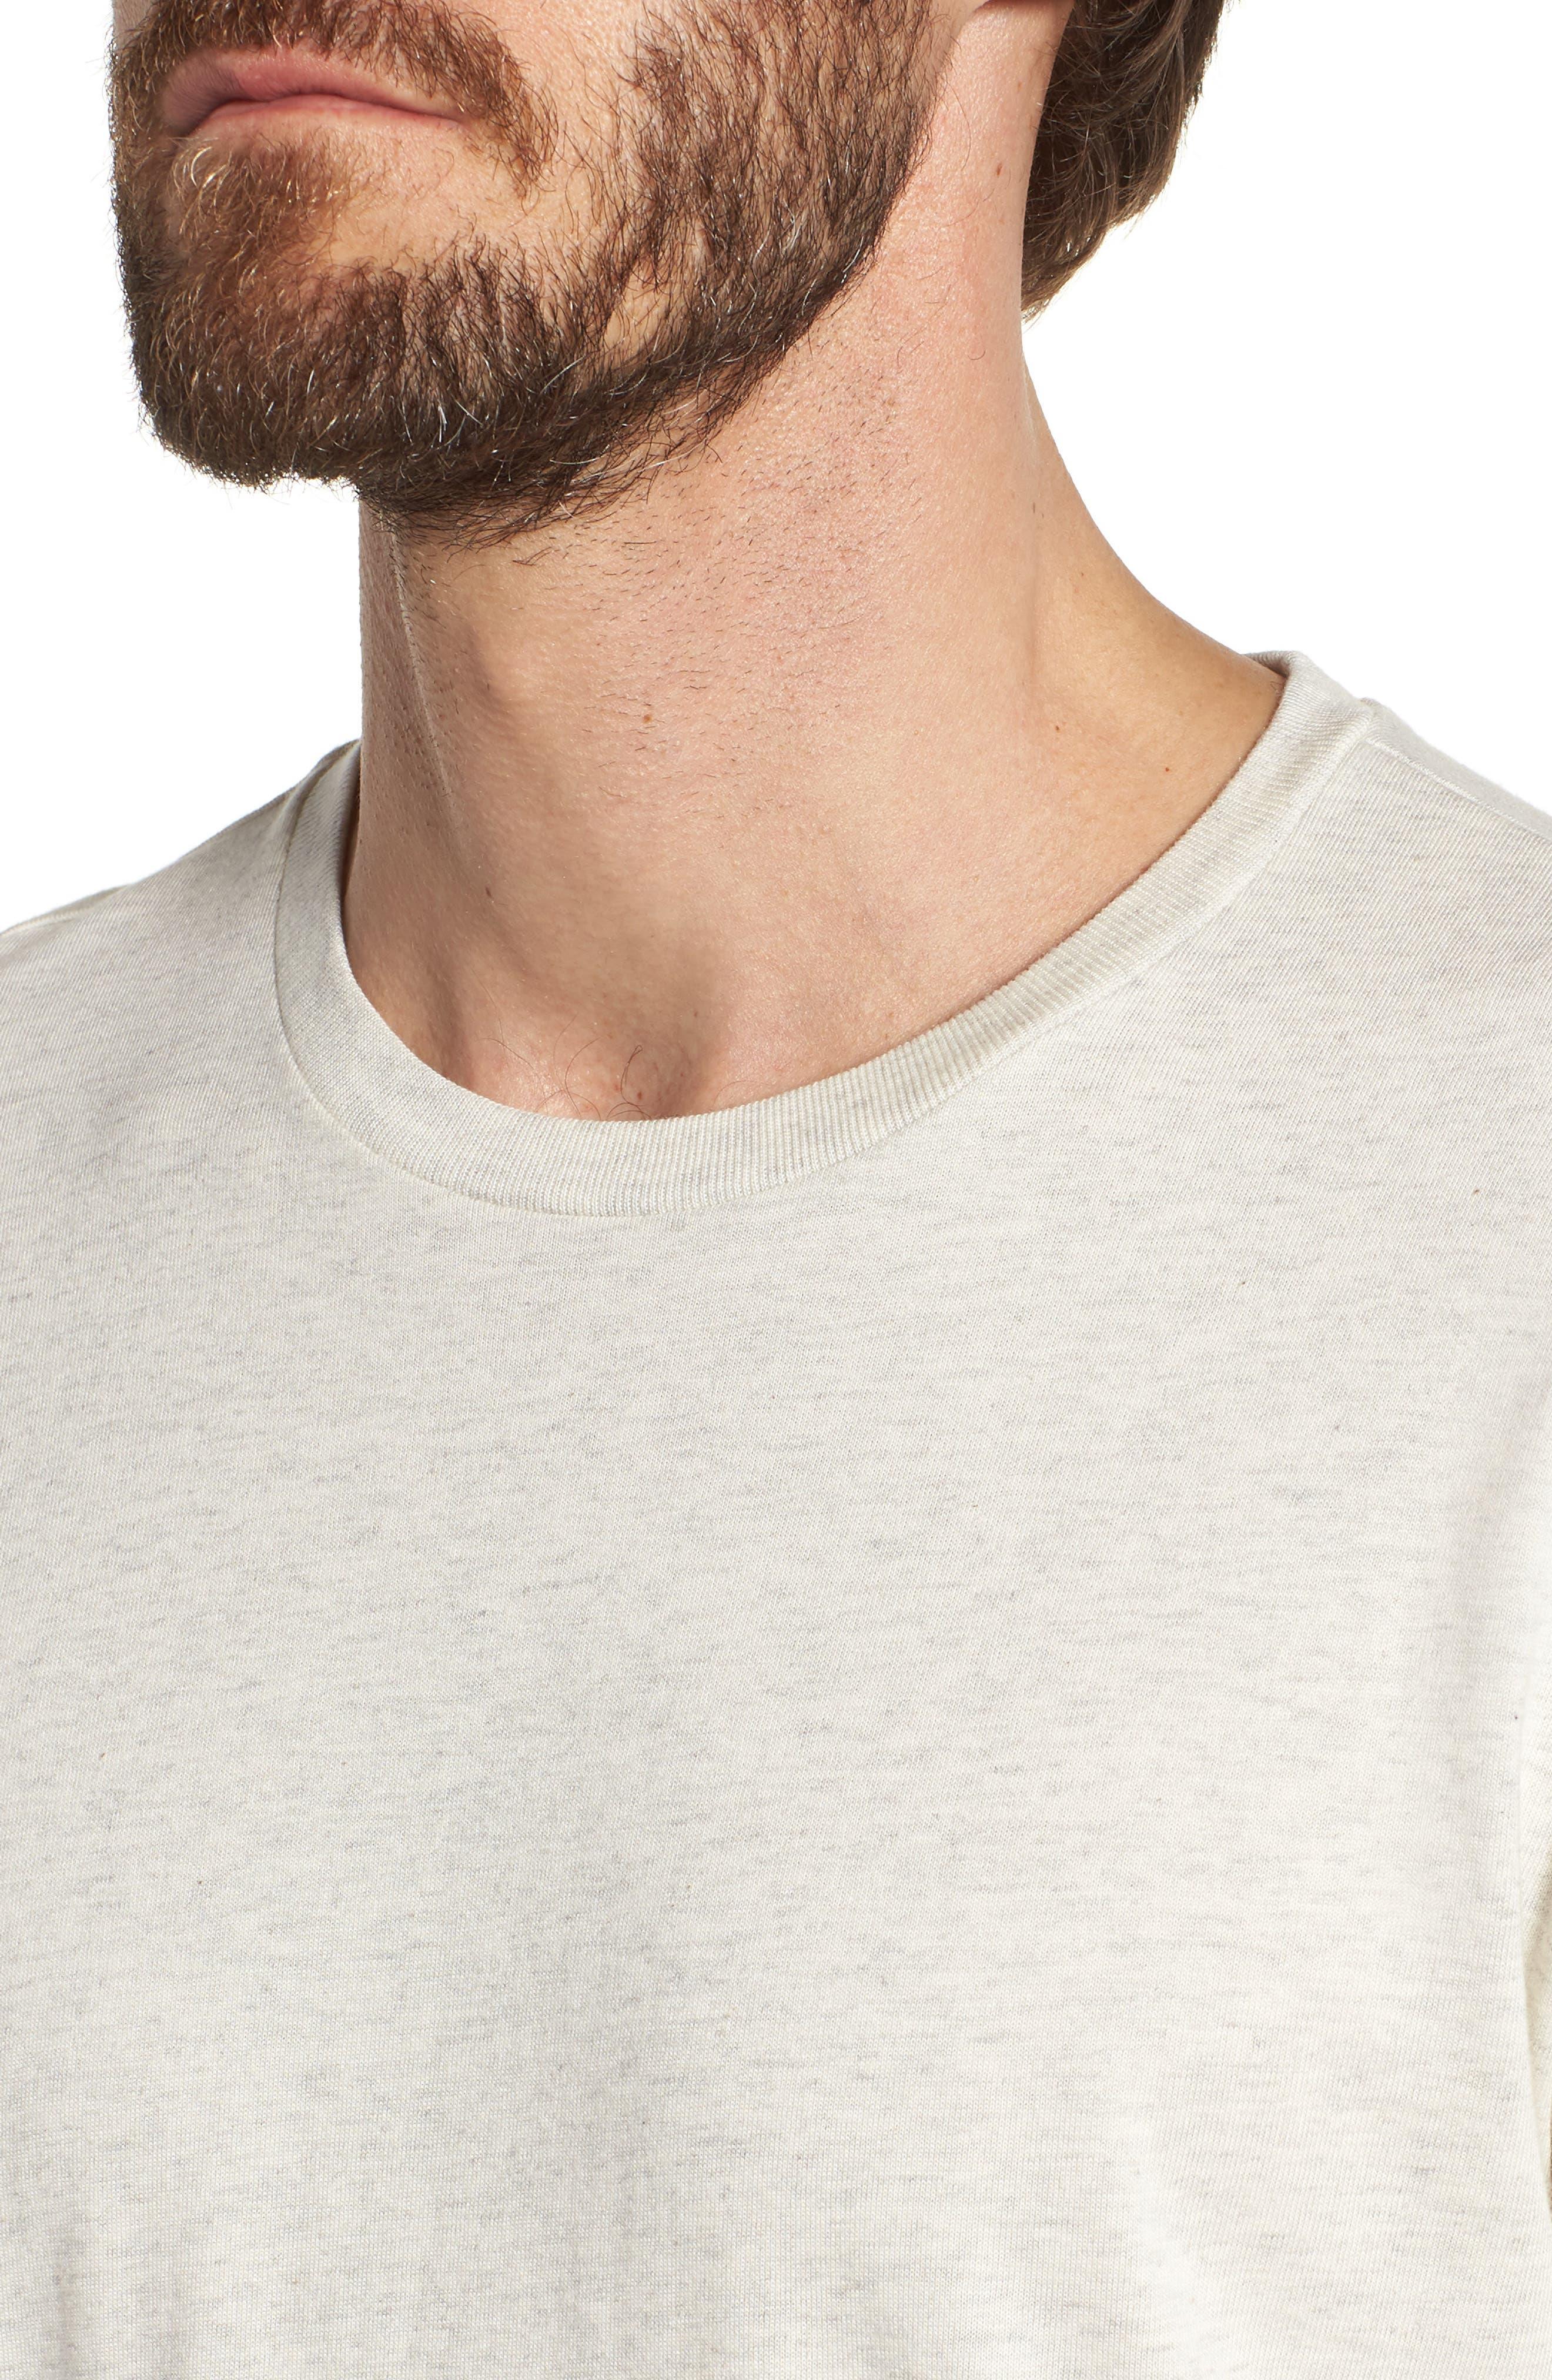 Supreme Comfort Crewneck T-Shirt,                             Alternate thumbnail 4, color,                             Sand Heather/ Bright Navy